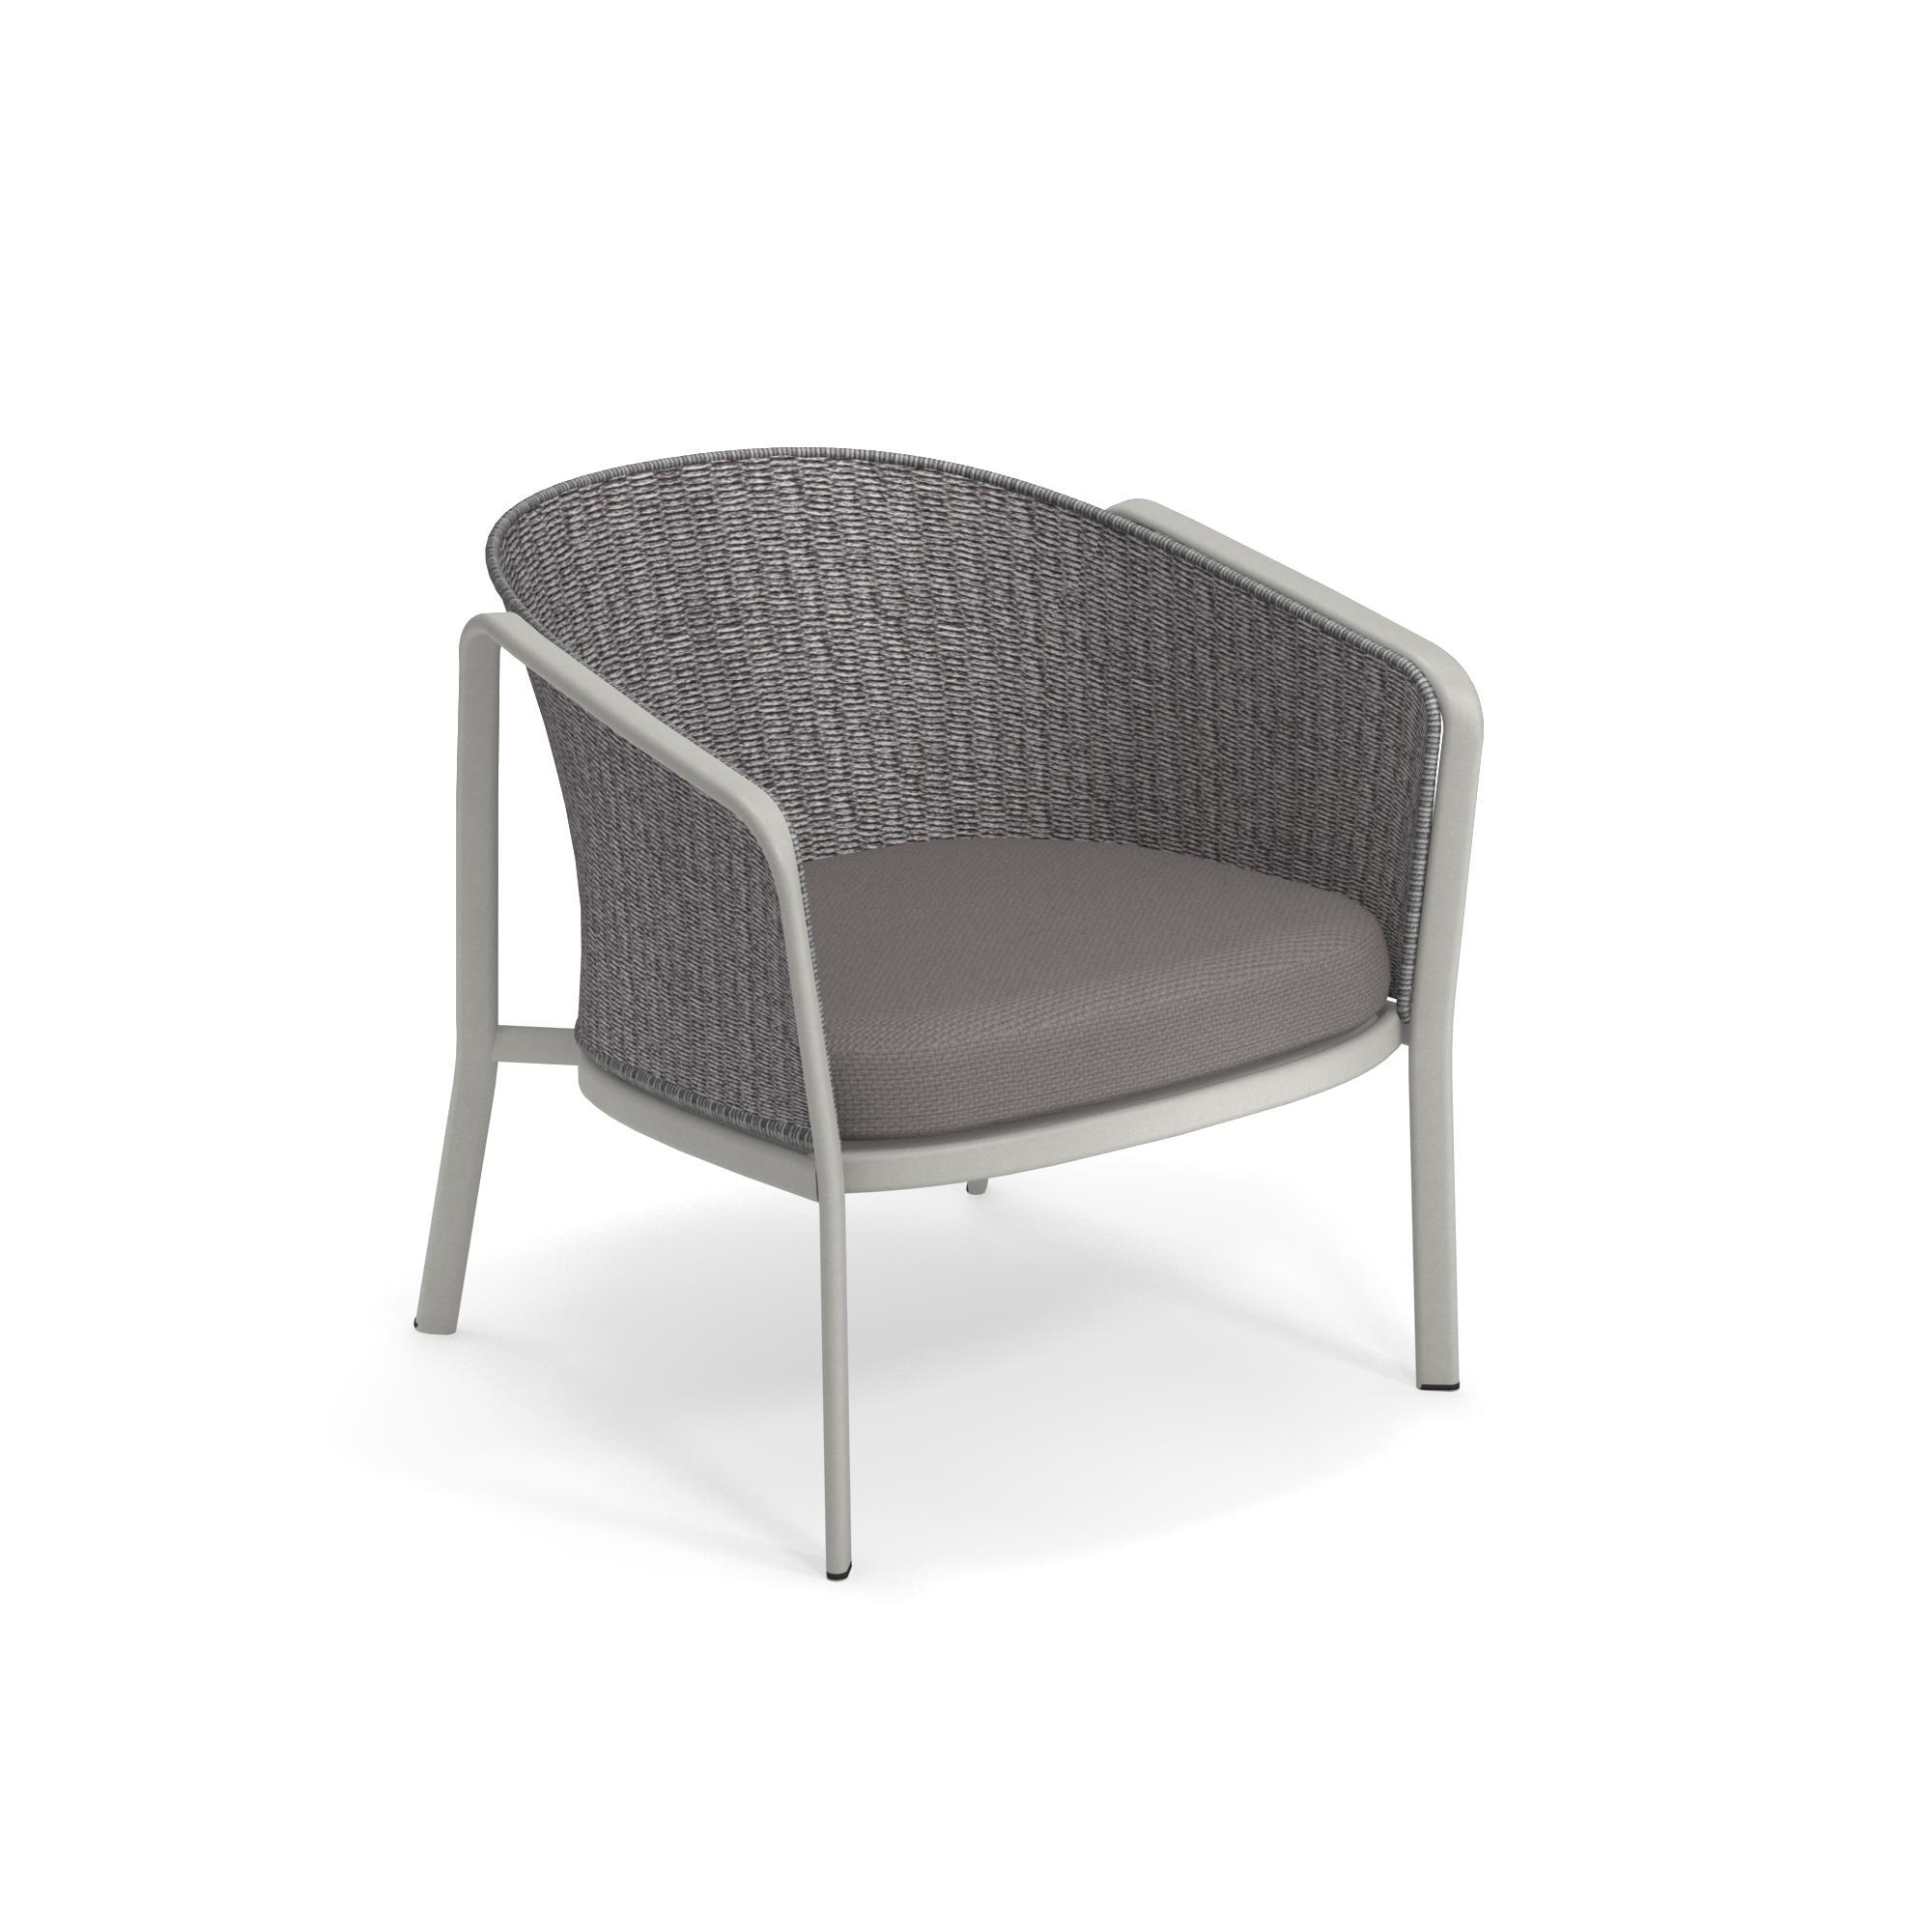 73-18 Zement - Grau Melange